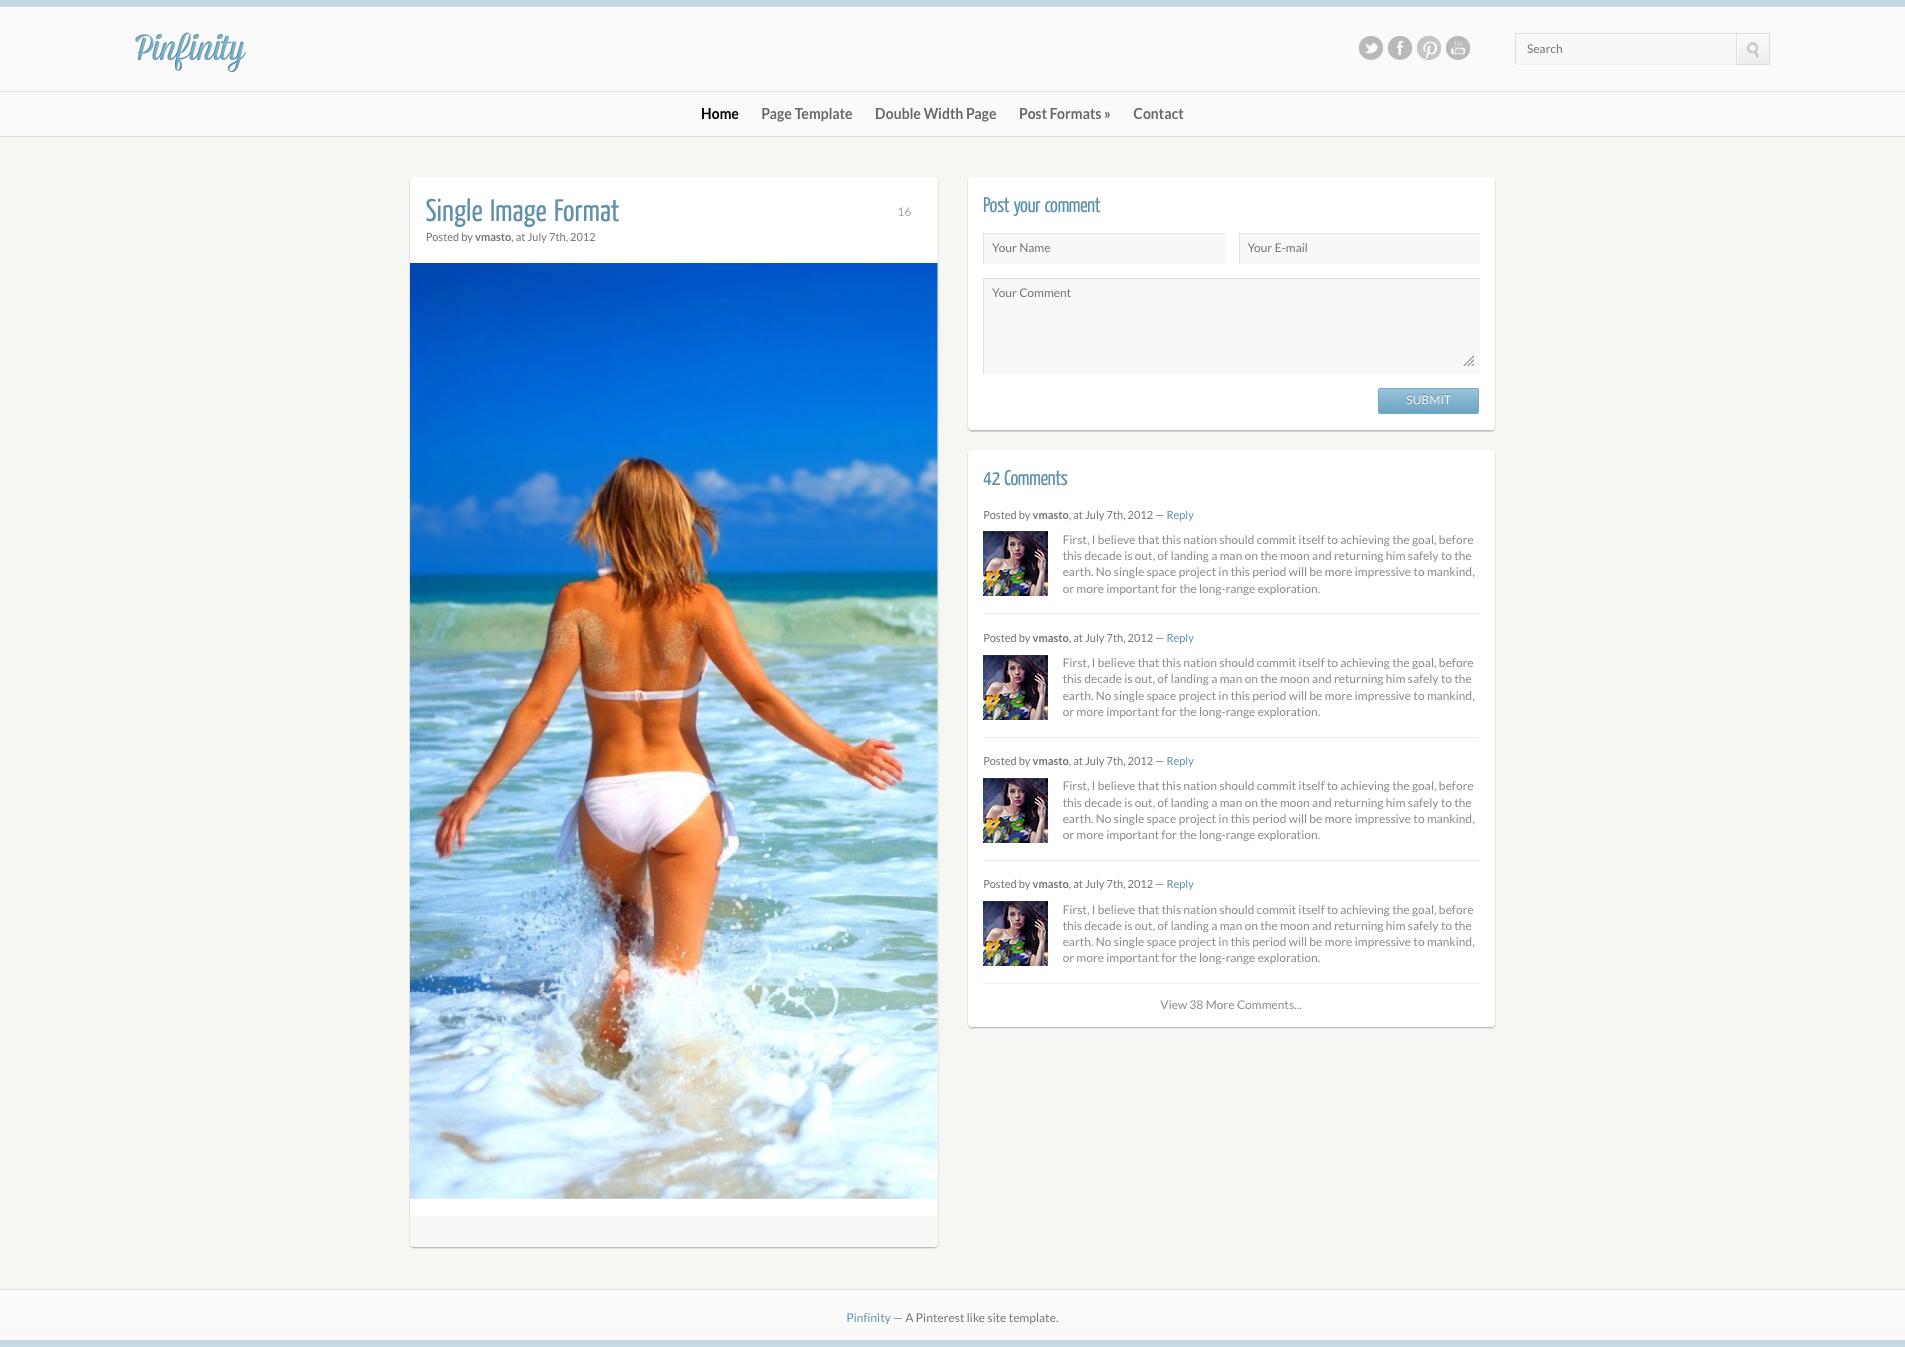 Pinfinity Responsive Tumblr-Like Site Template